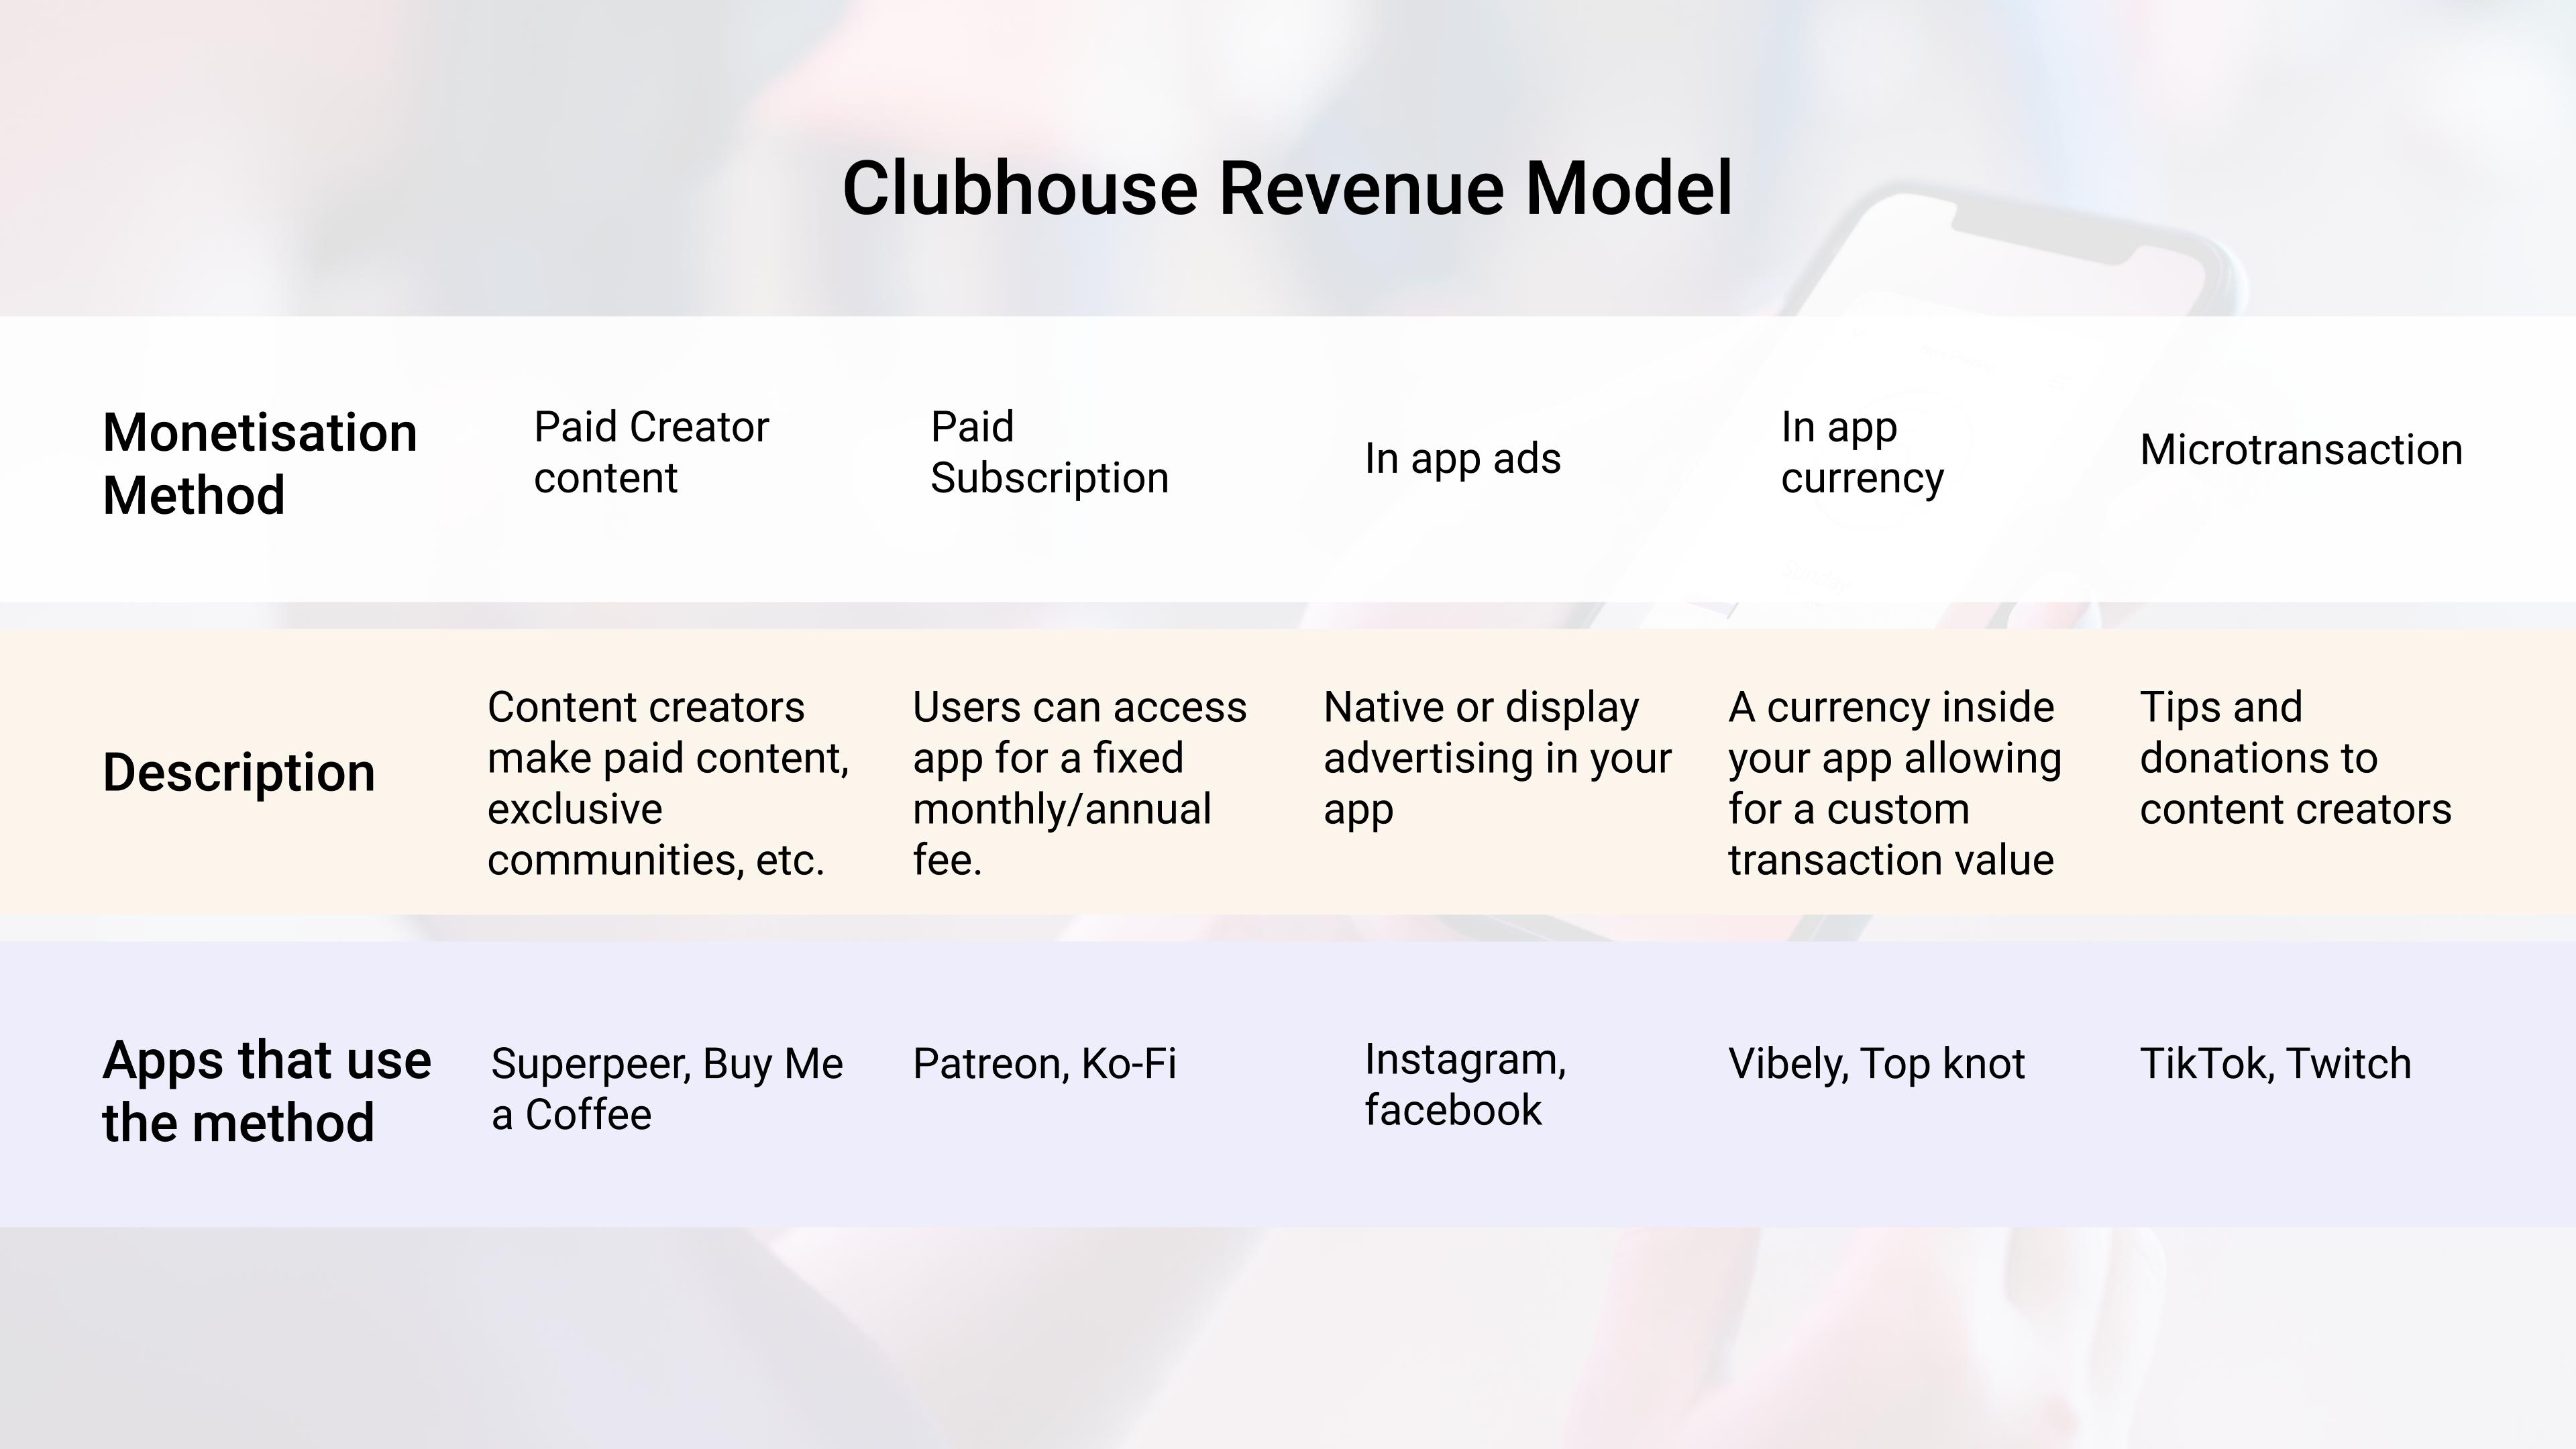 ClubHouse app revenue model